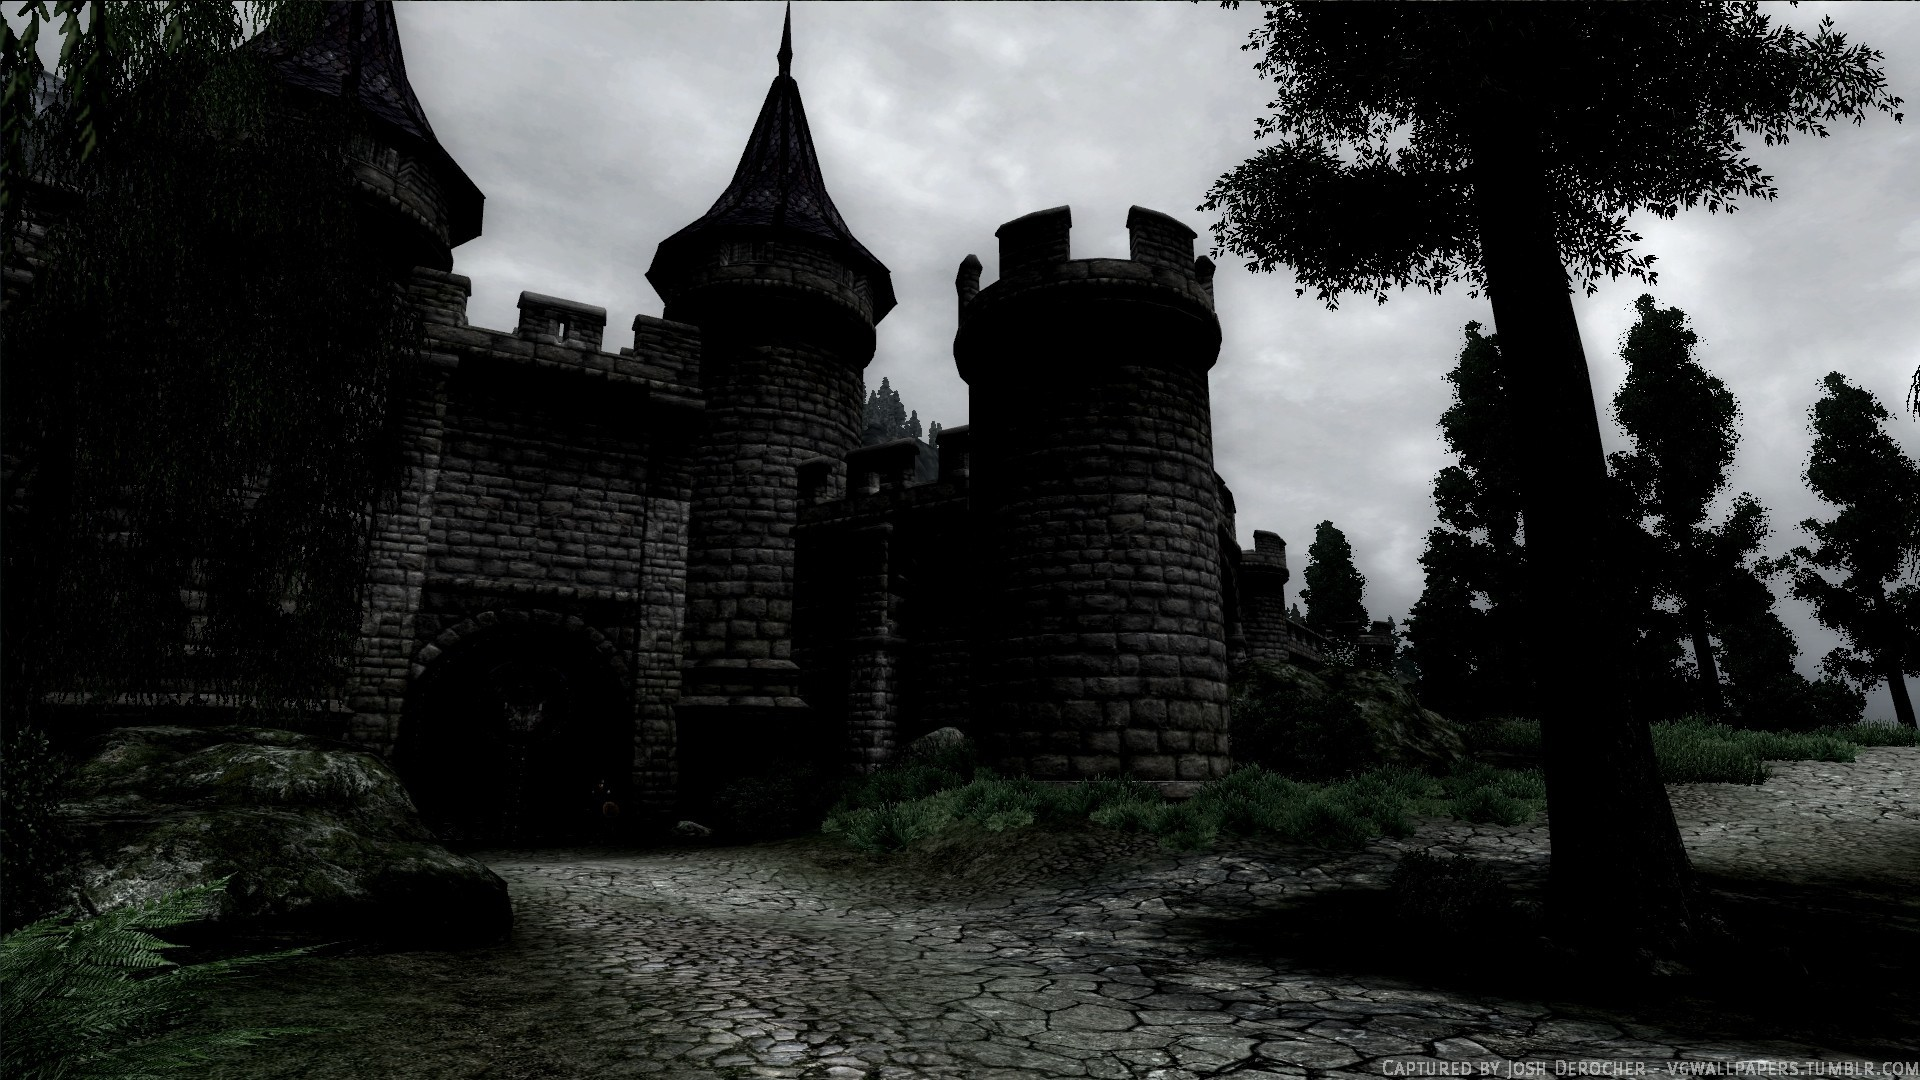 Res: 1920x1080, Dark Castle Backgrounds  px (Mobile and Desktop)